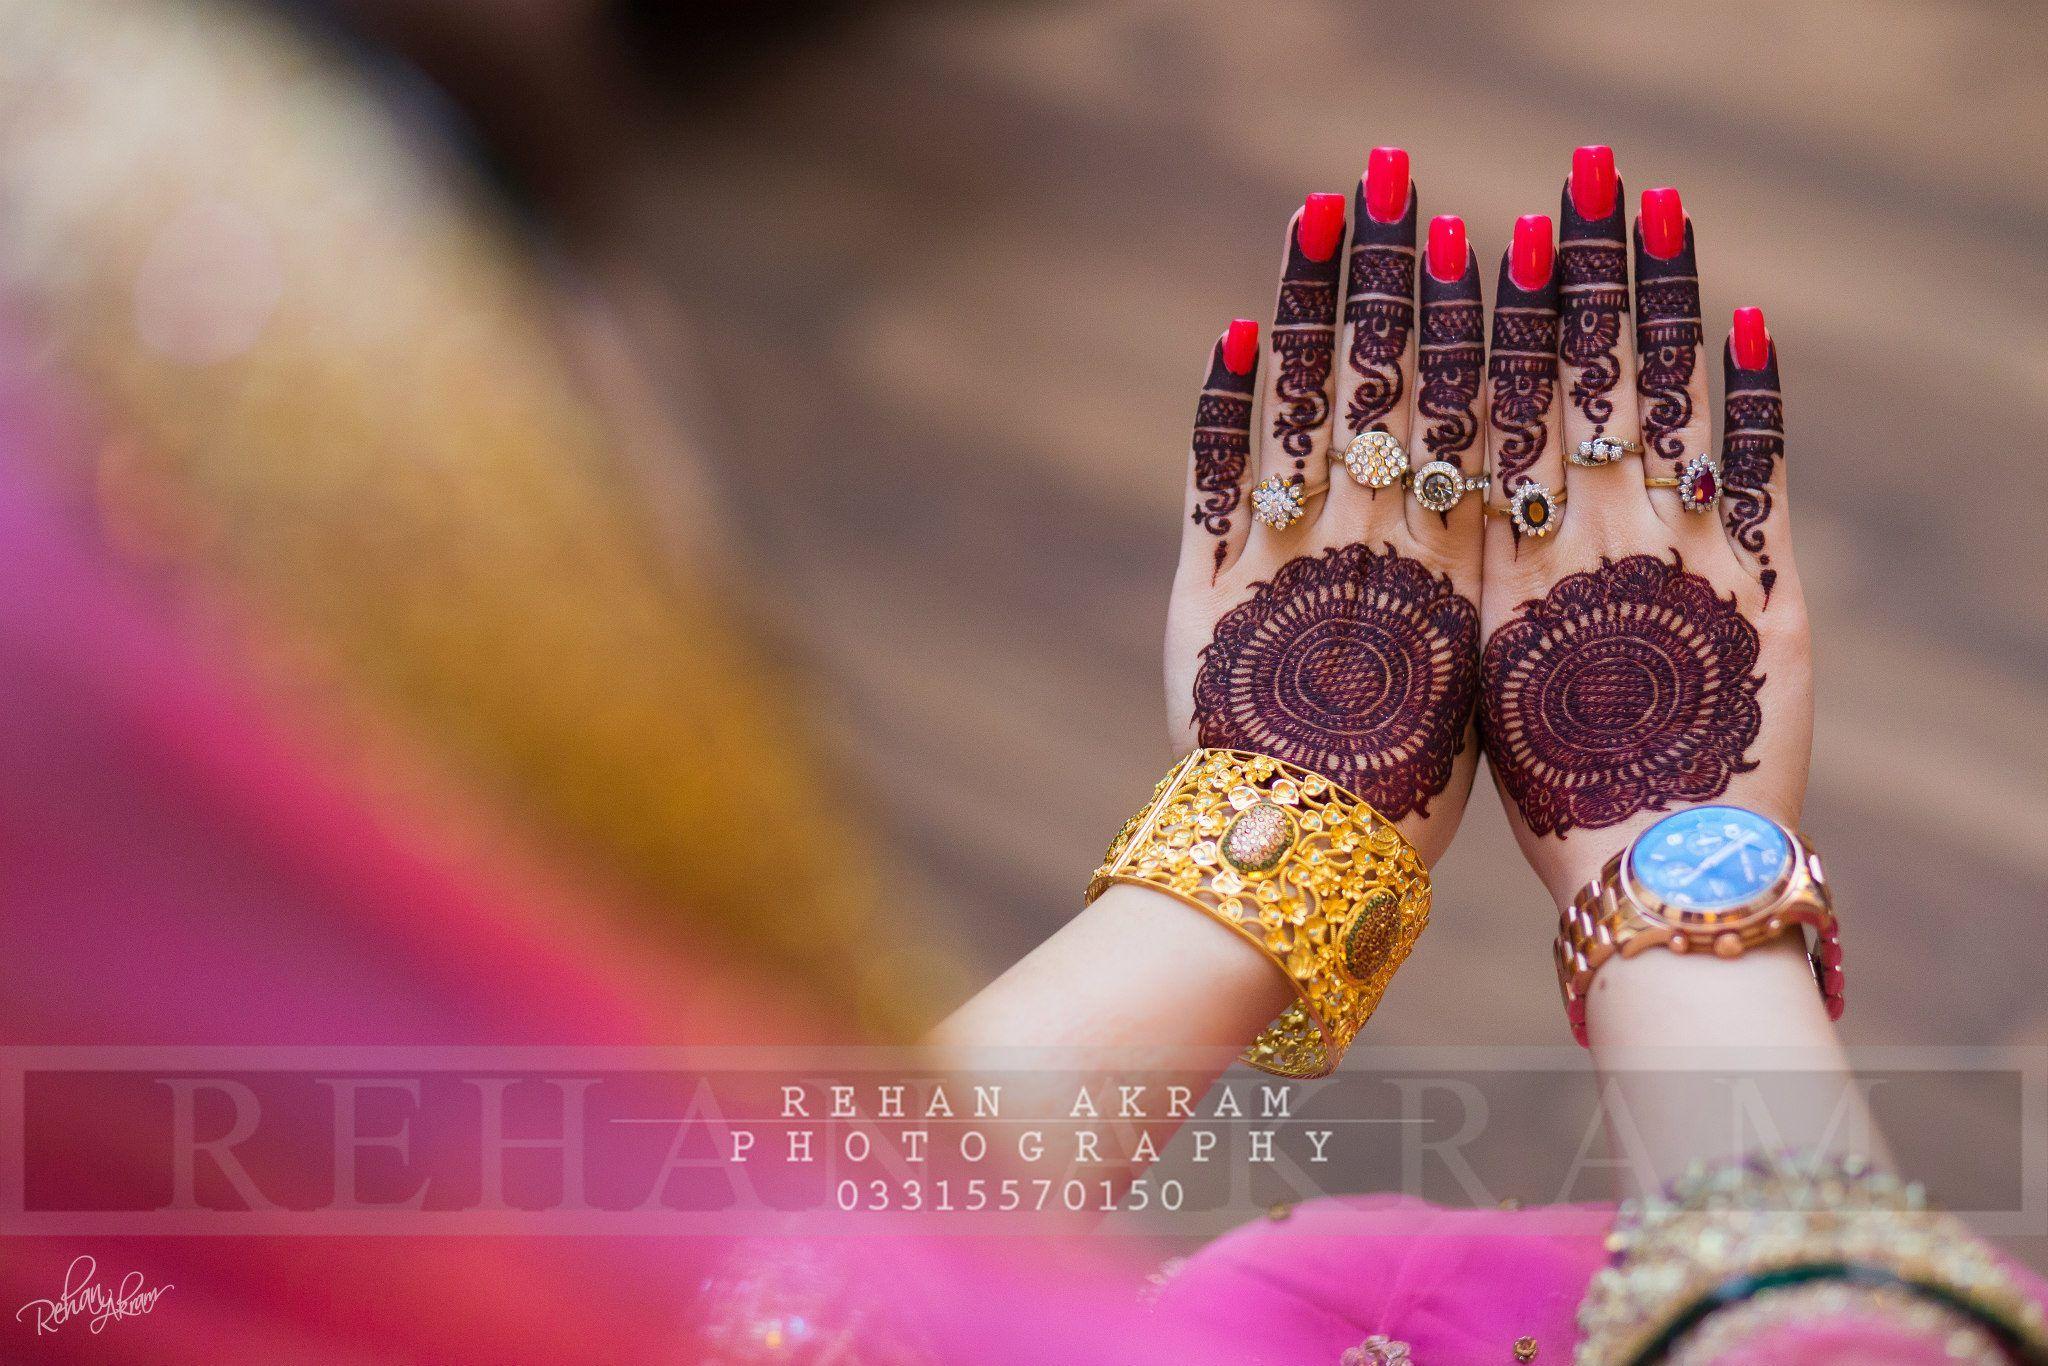 Rehan akram photography | Beautiful Bridal hands | Pinterest ...